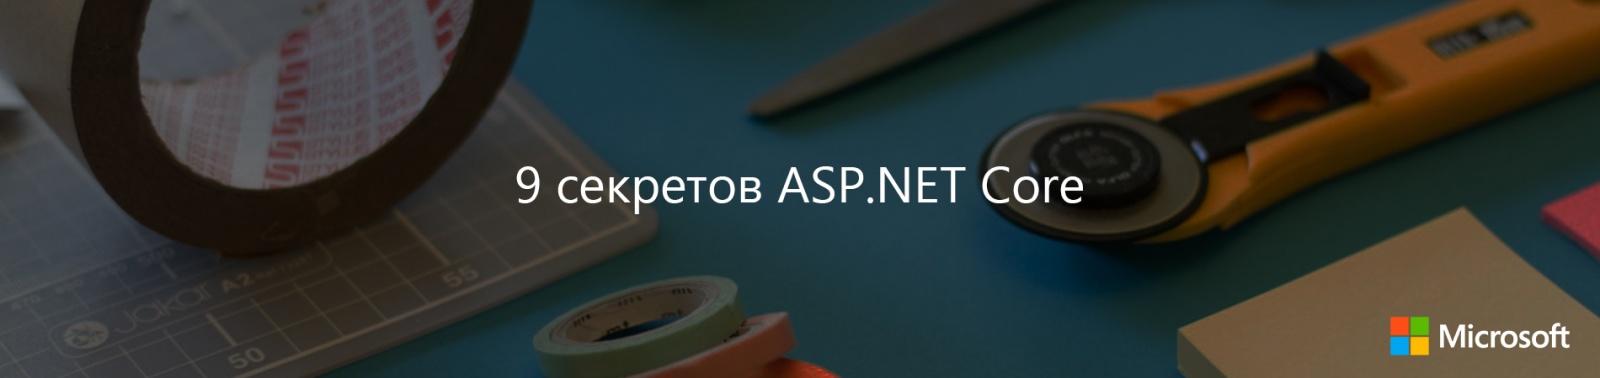 9 секретов ASP.NET Core - 1